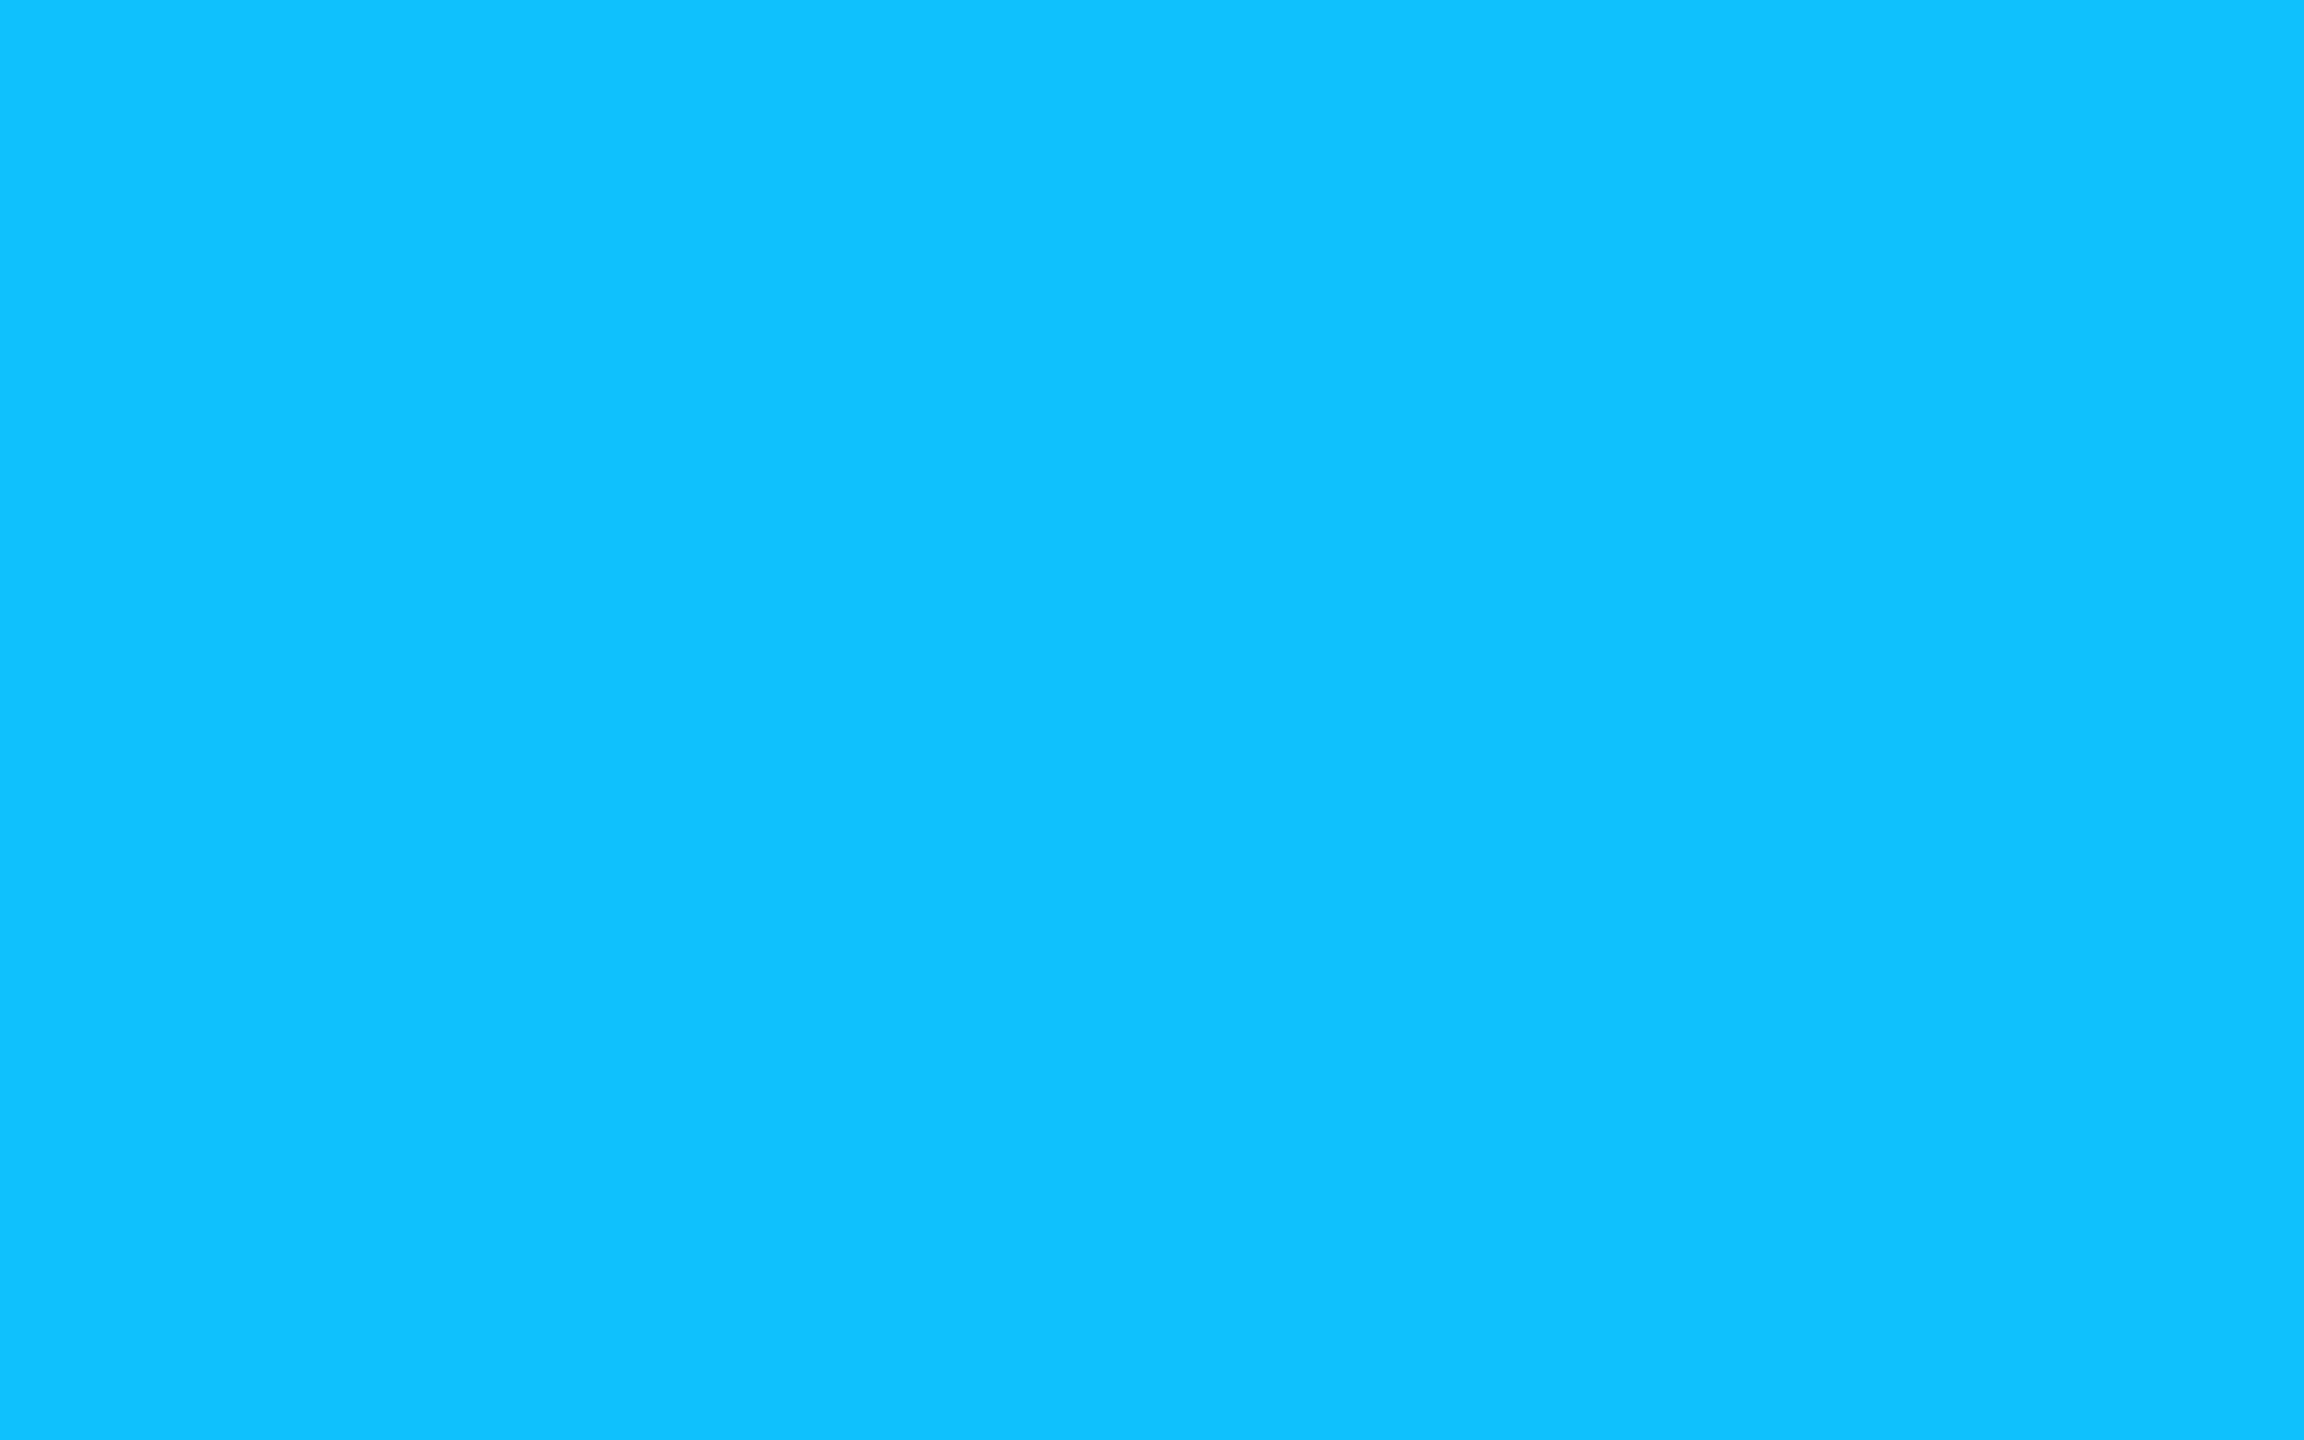 2304x1440 Spiro Disco Ball Solid Color Background